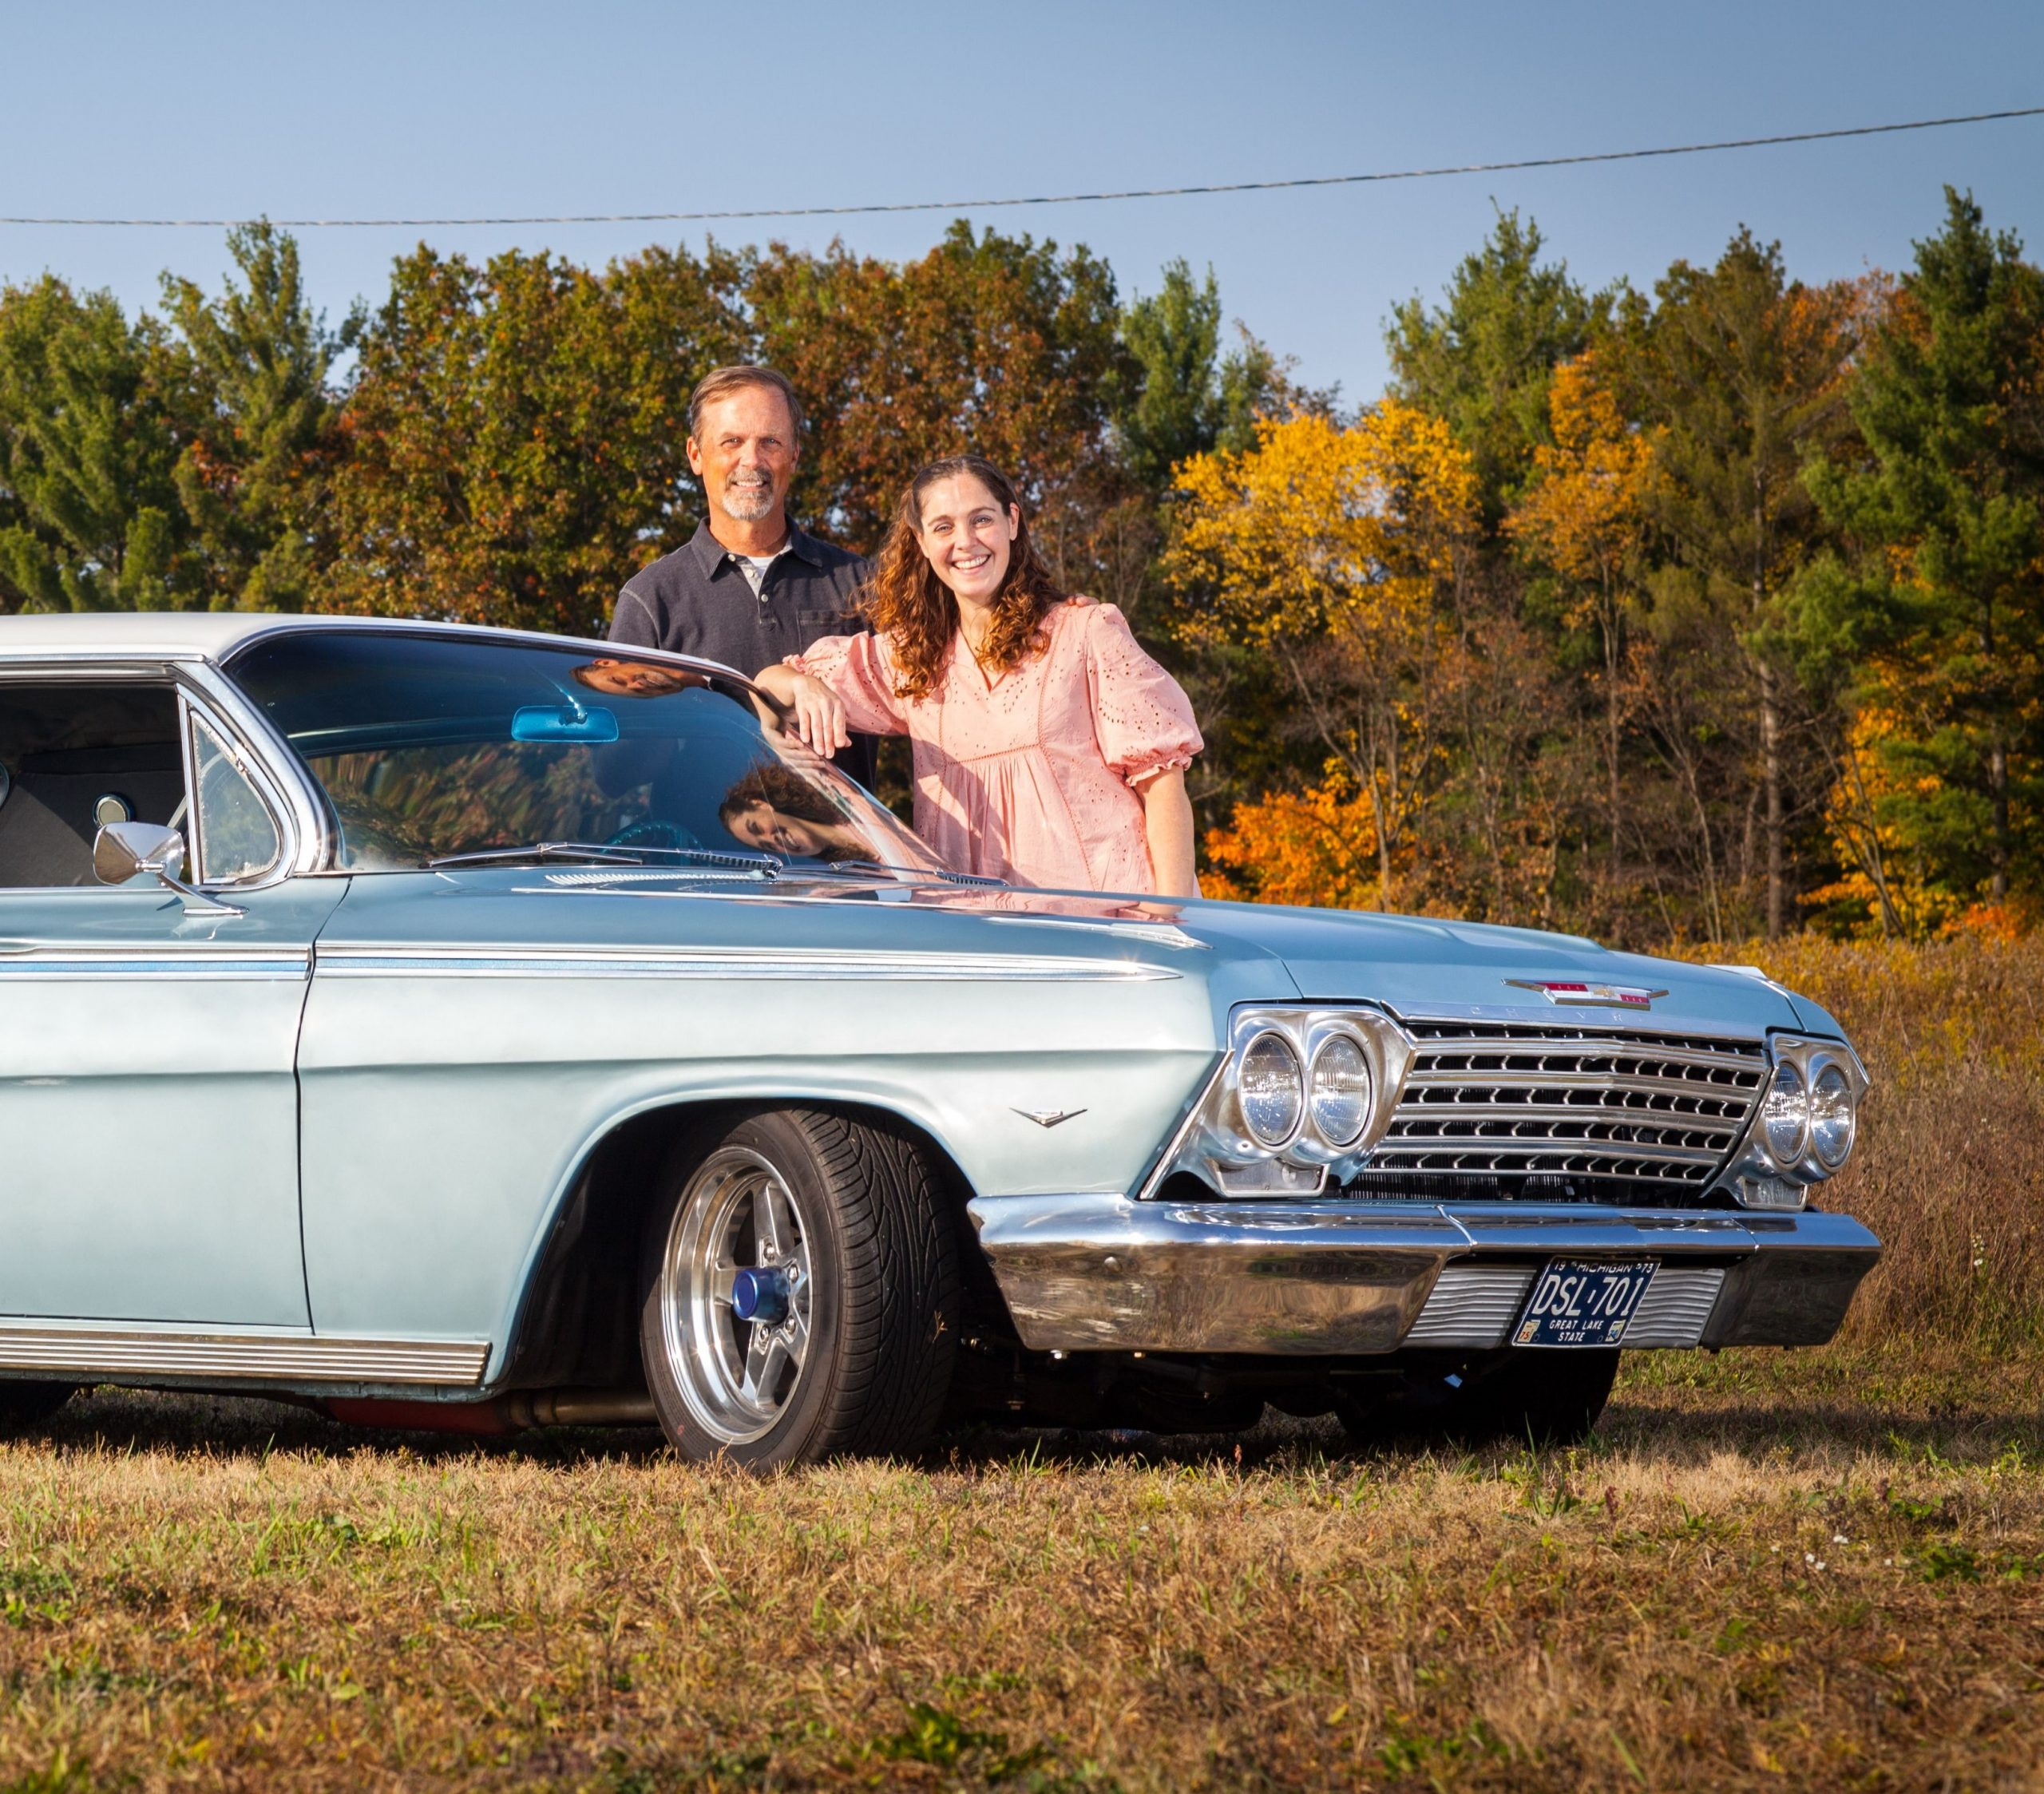 Jason Prince - 1962 Chevrolet Impala - Jason and Lynn outside the car